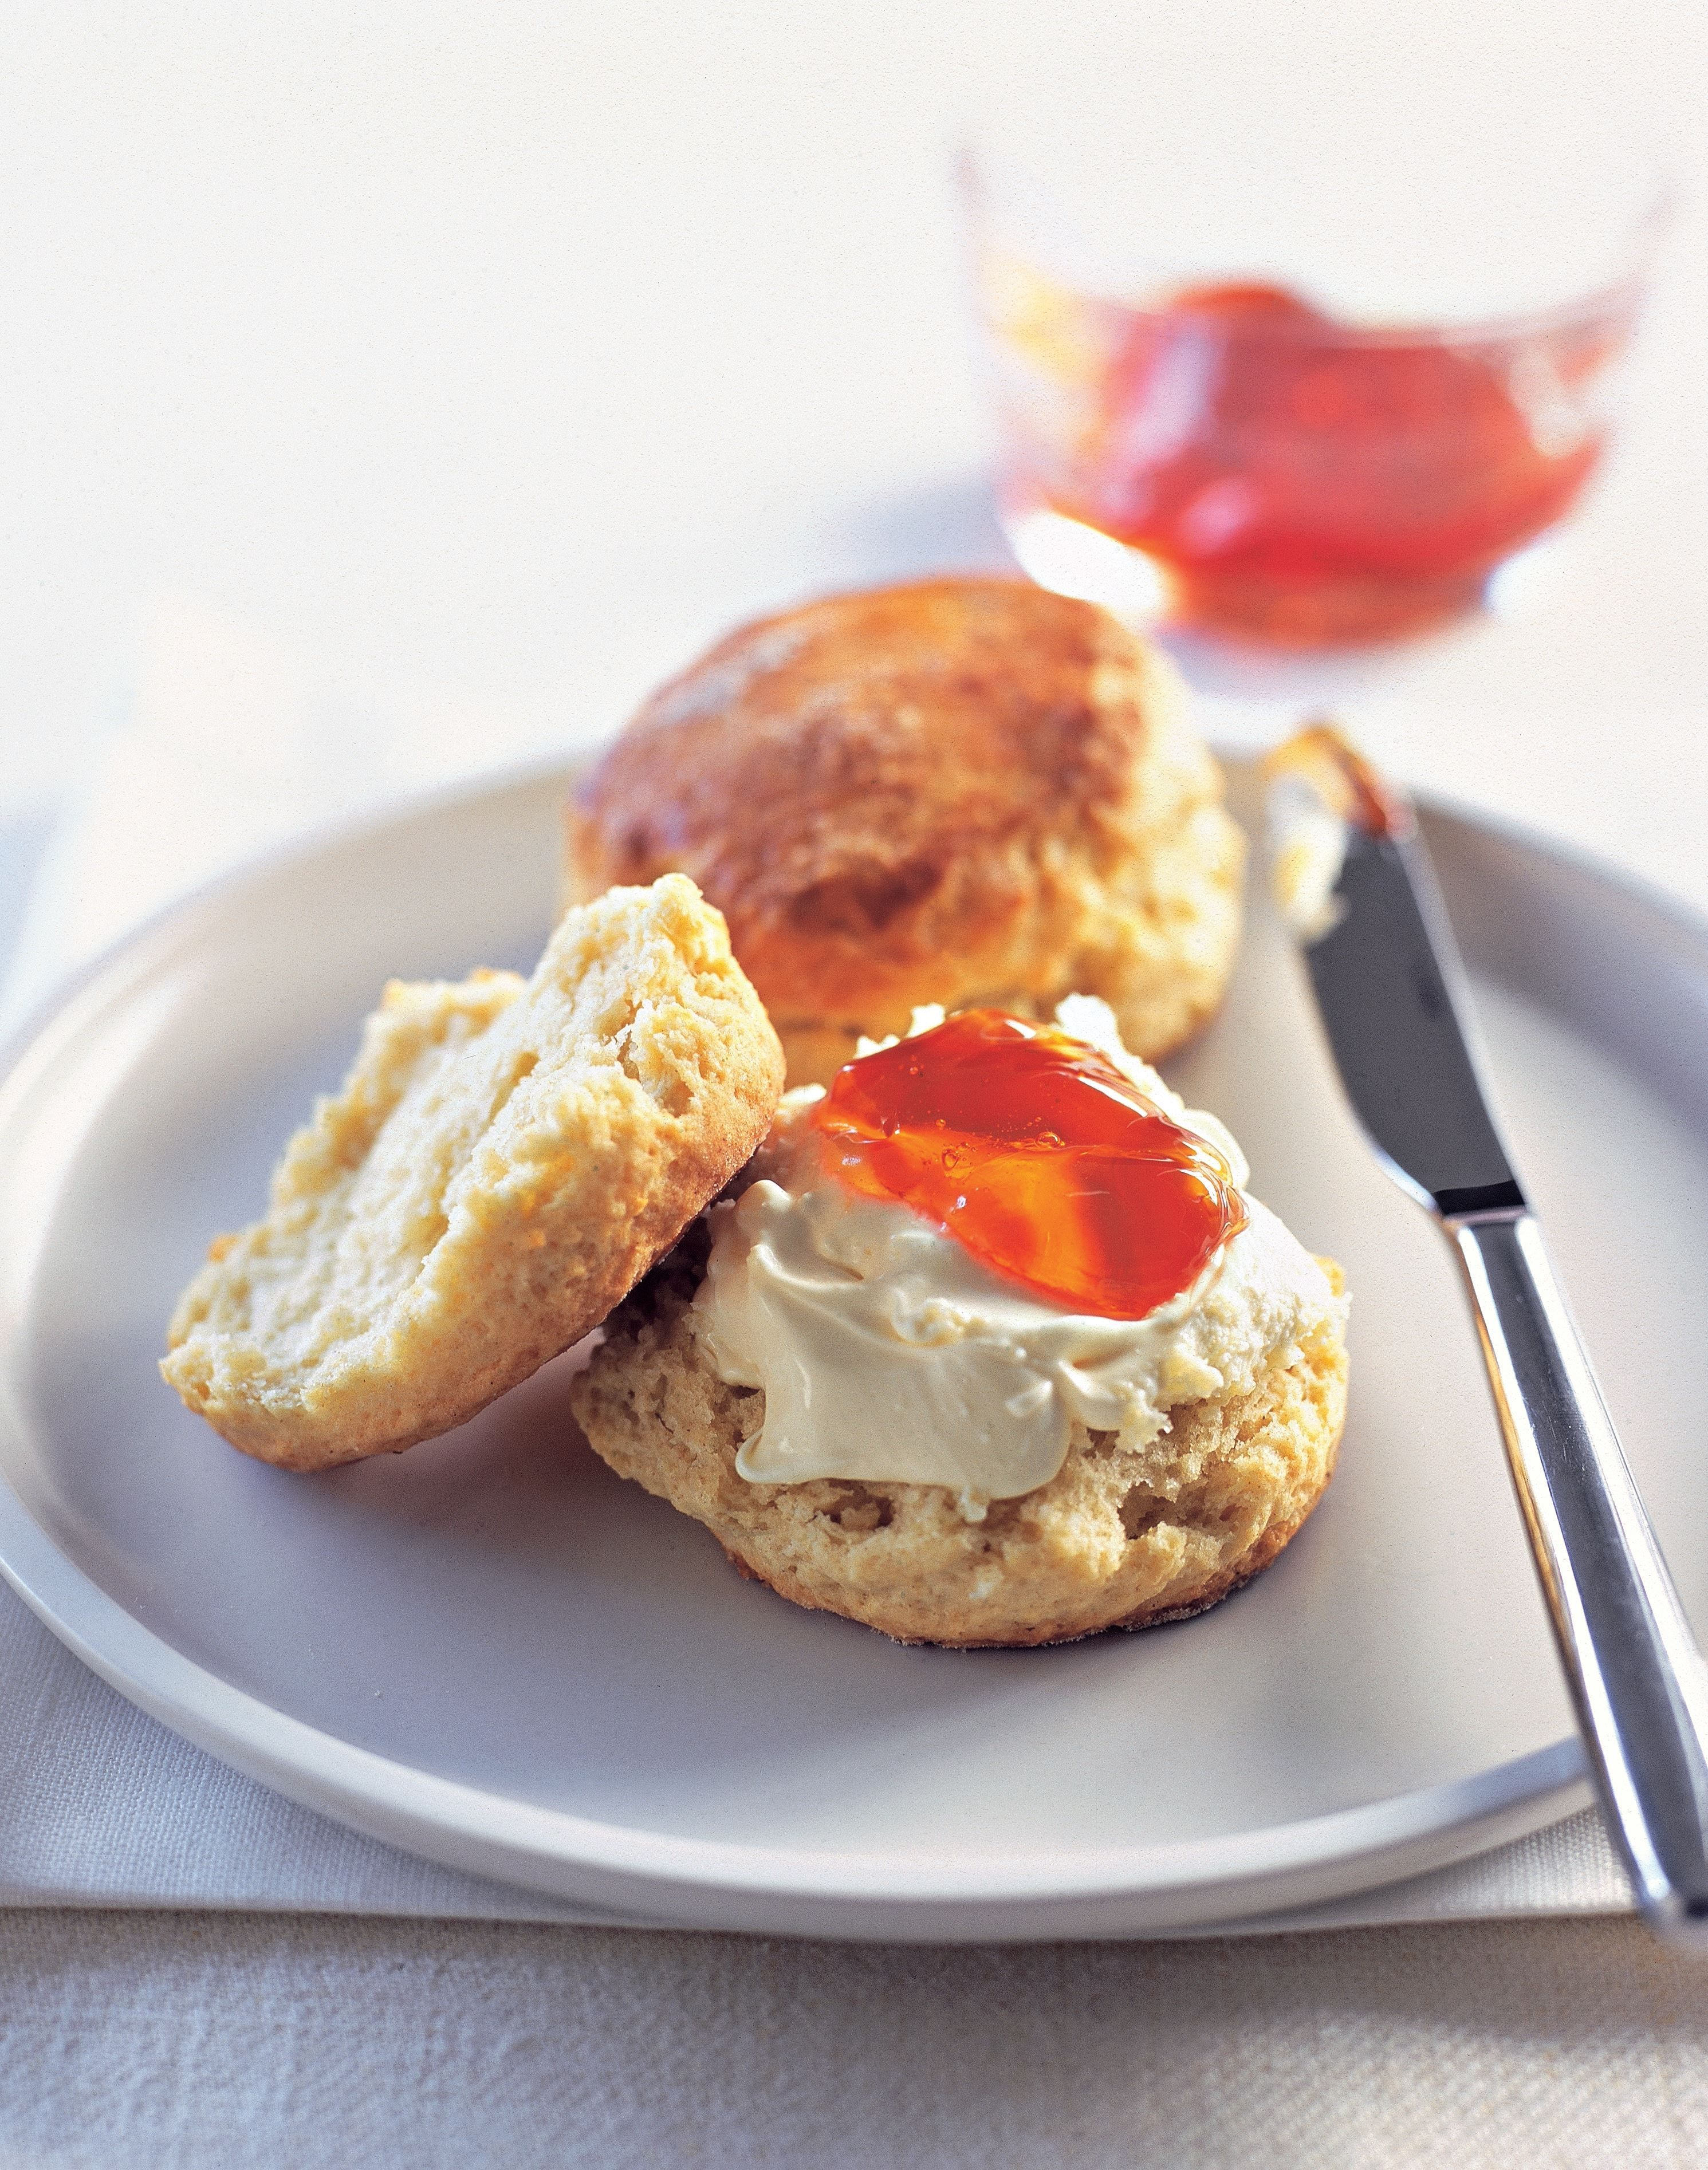 Buttermilk scones recipe from Desserts by James Martin